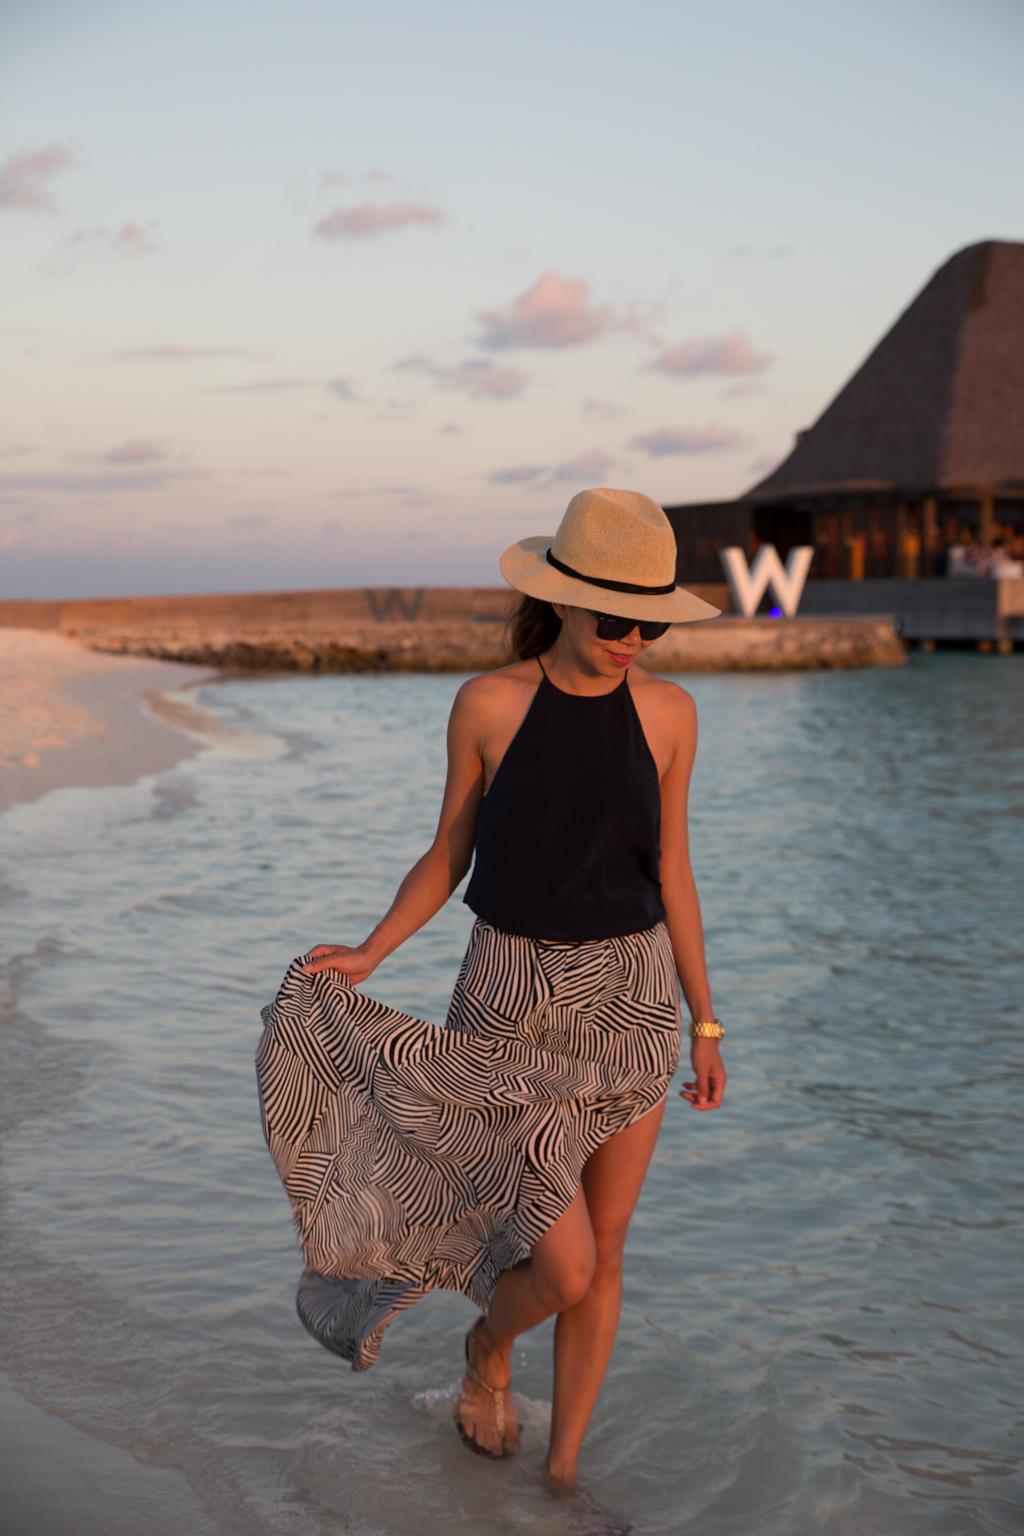 Startwithblack Maldives trip2